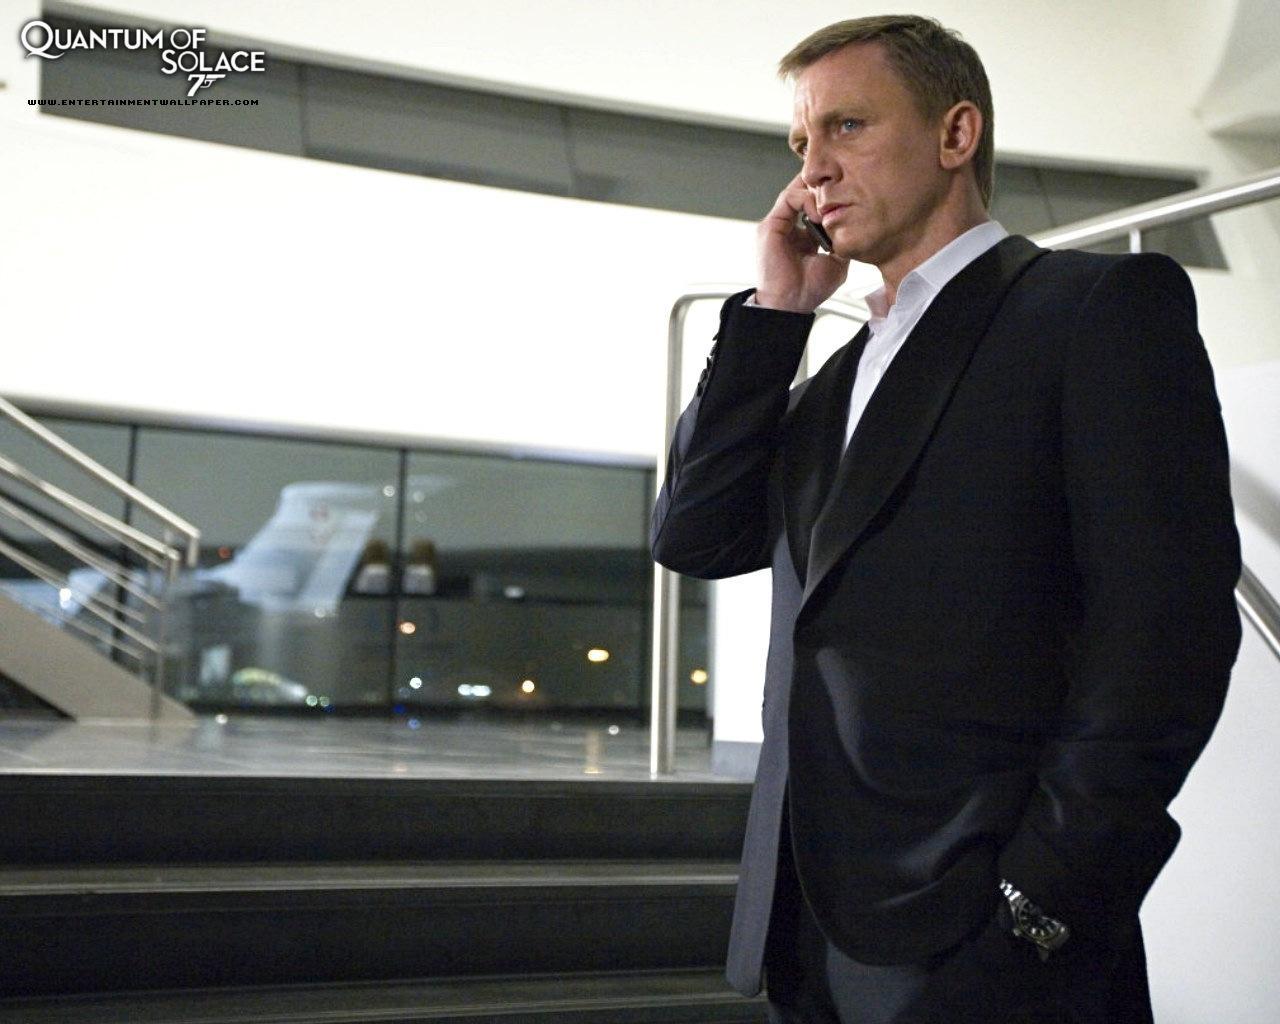 Image James Bond Quantum Of Solace Movies